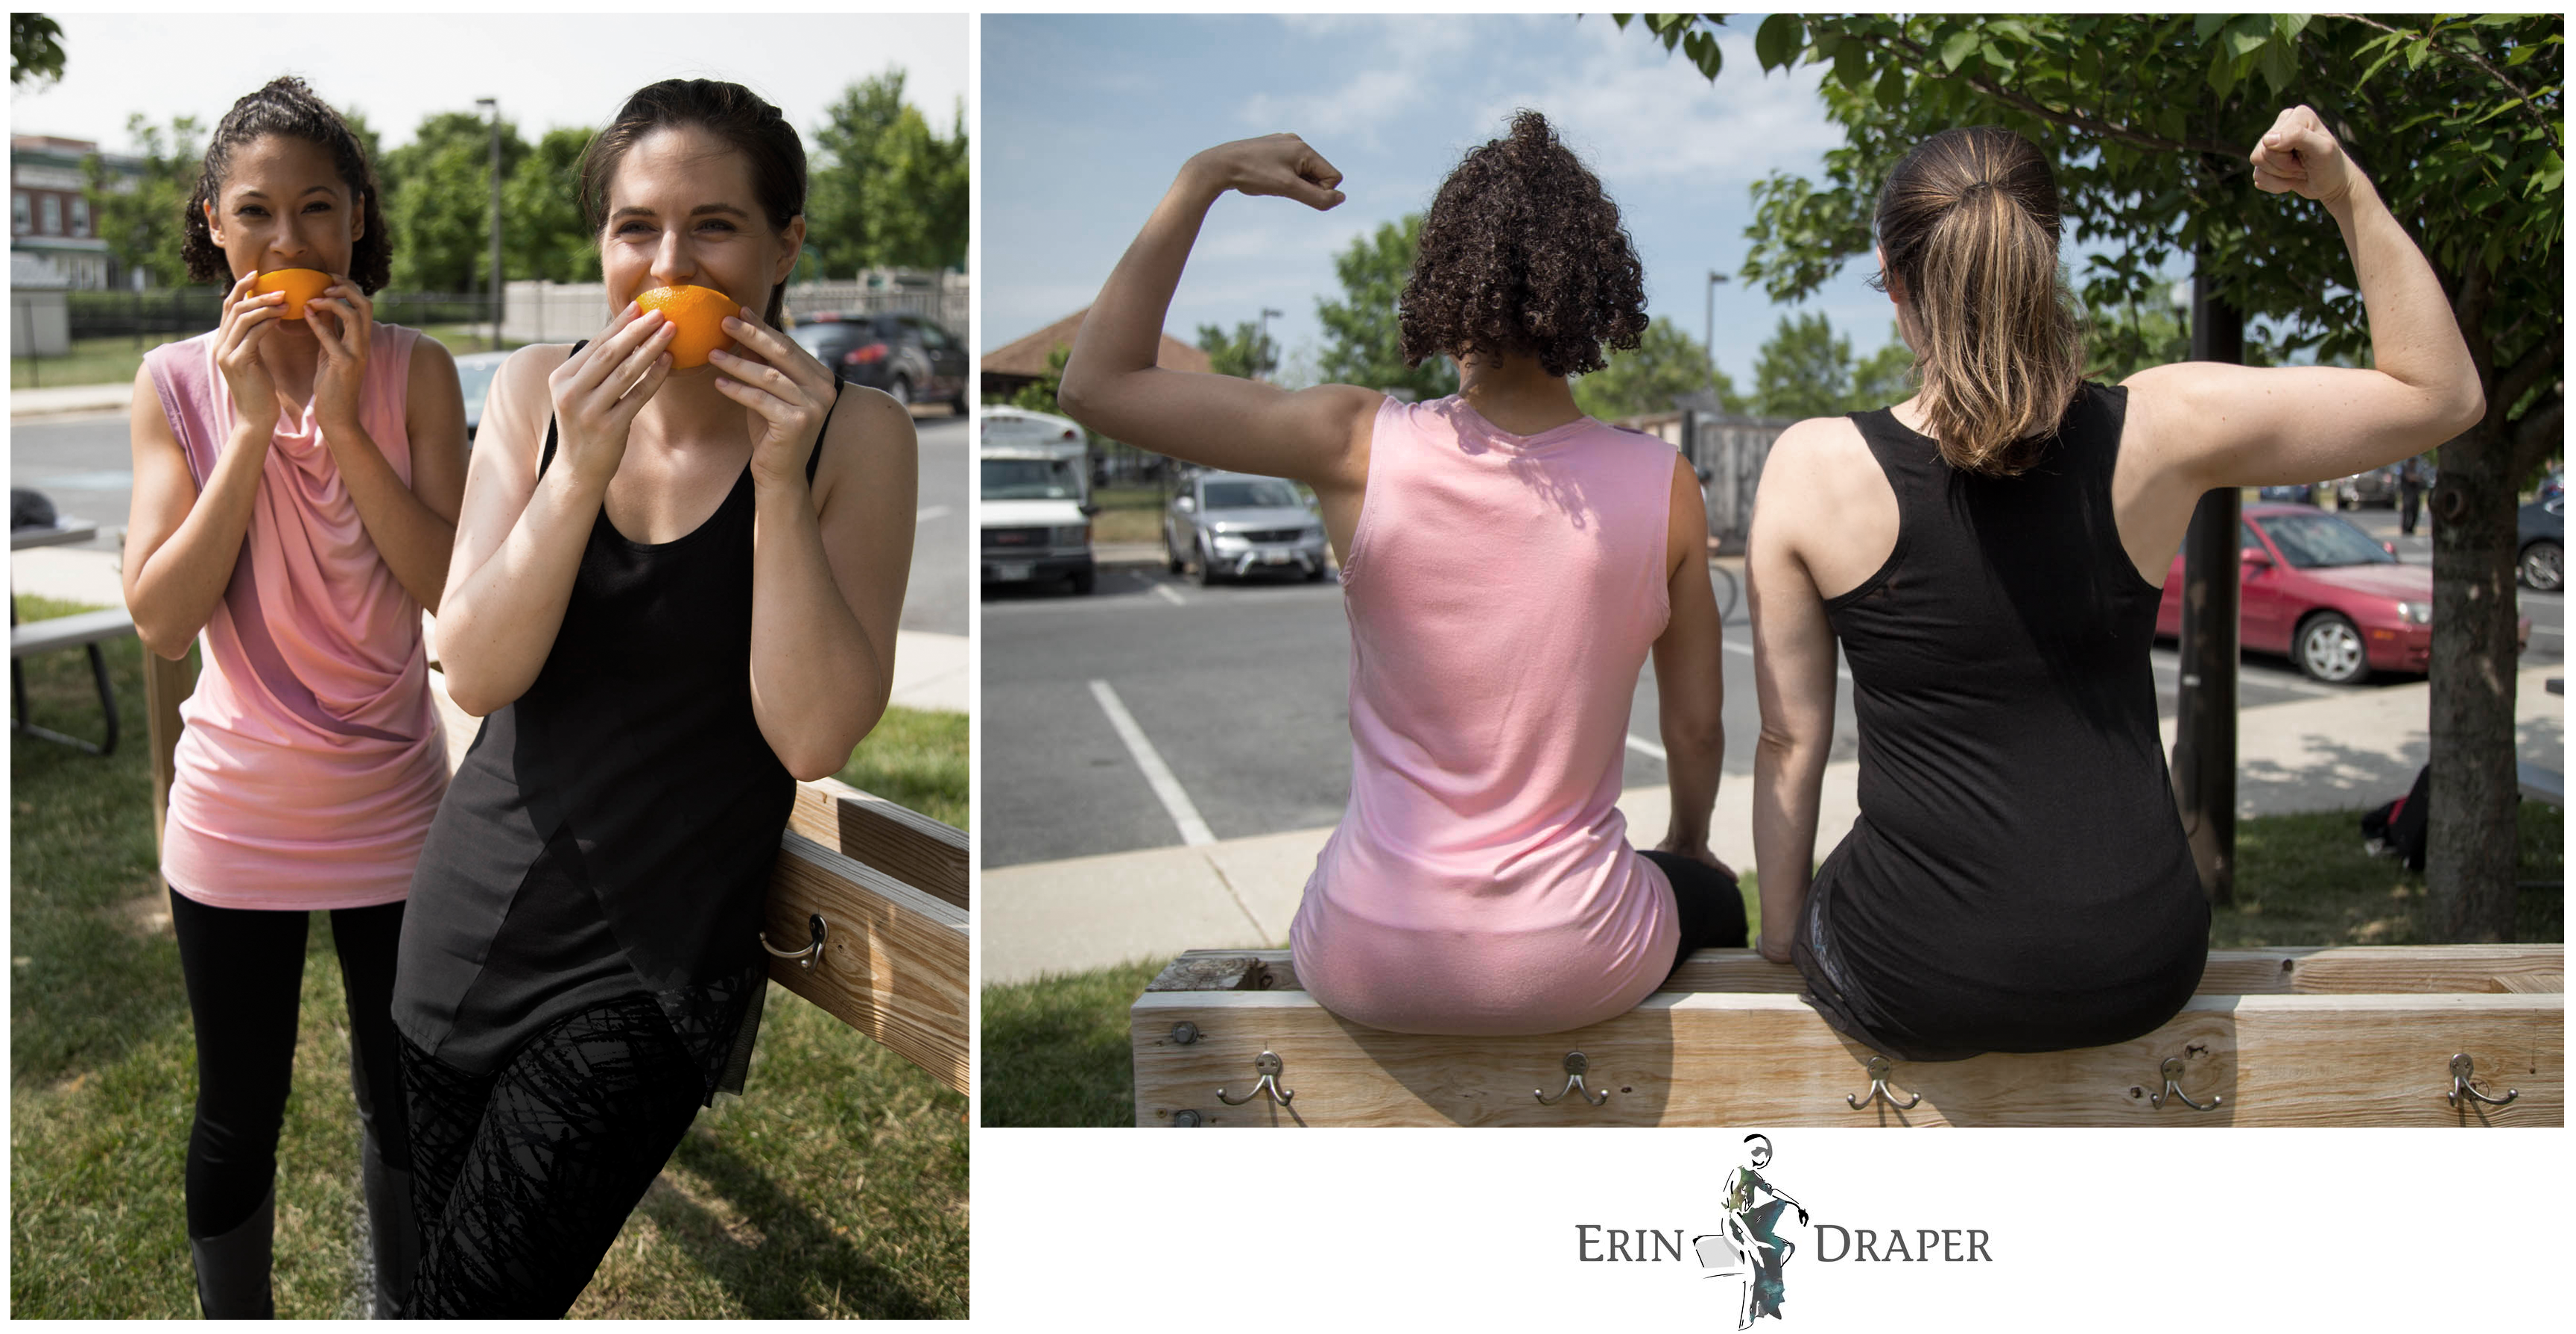 Erin-Draper-13-14